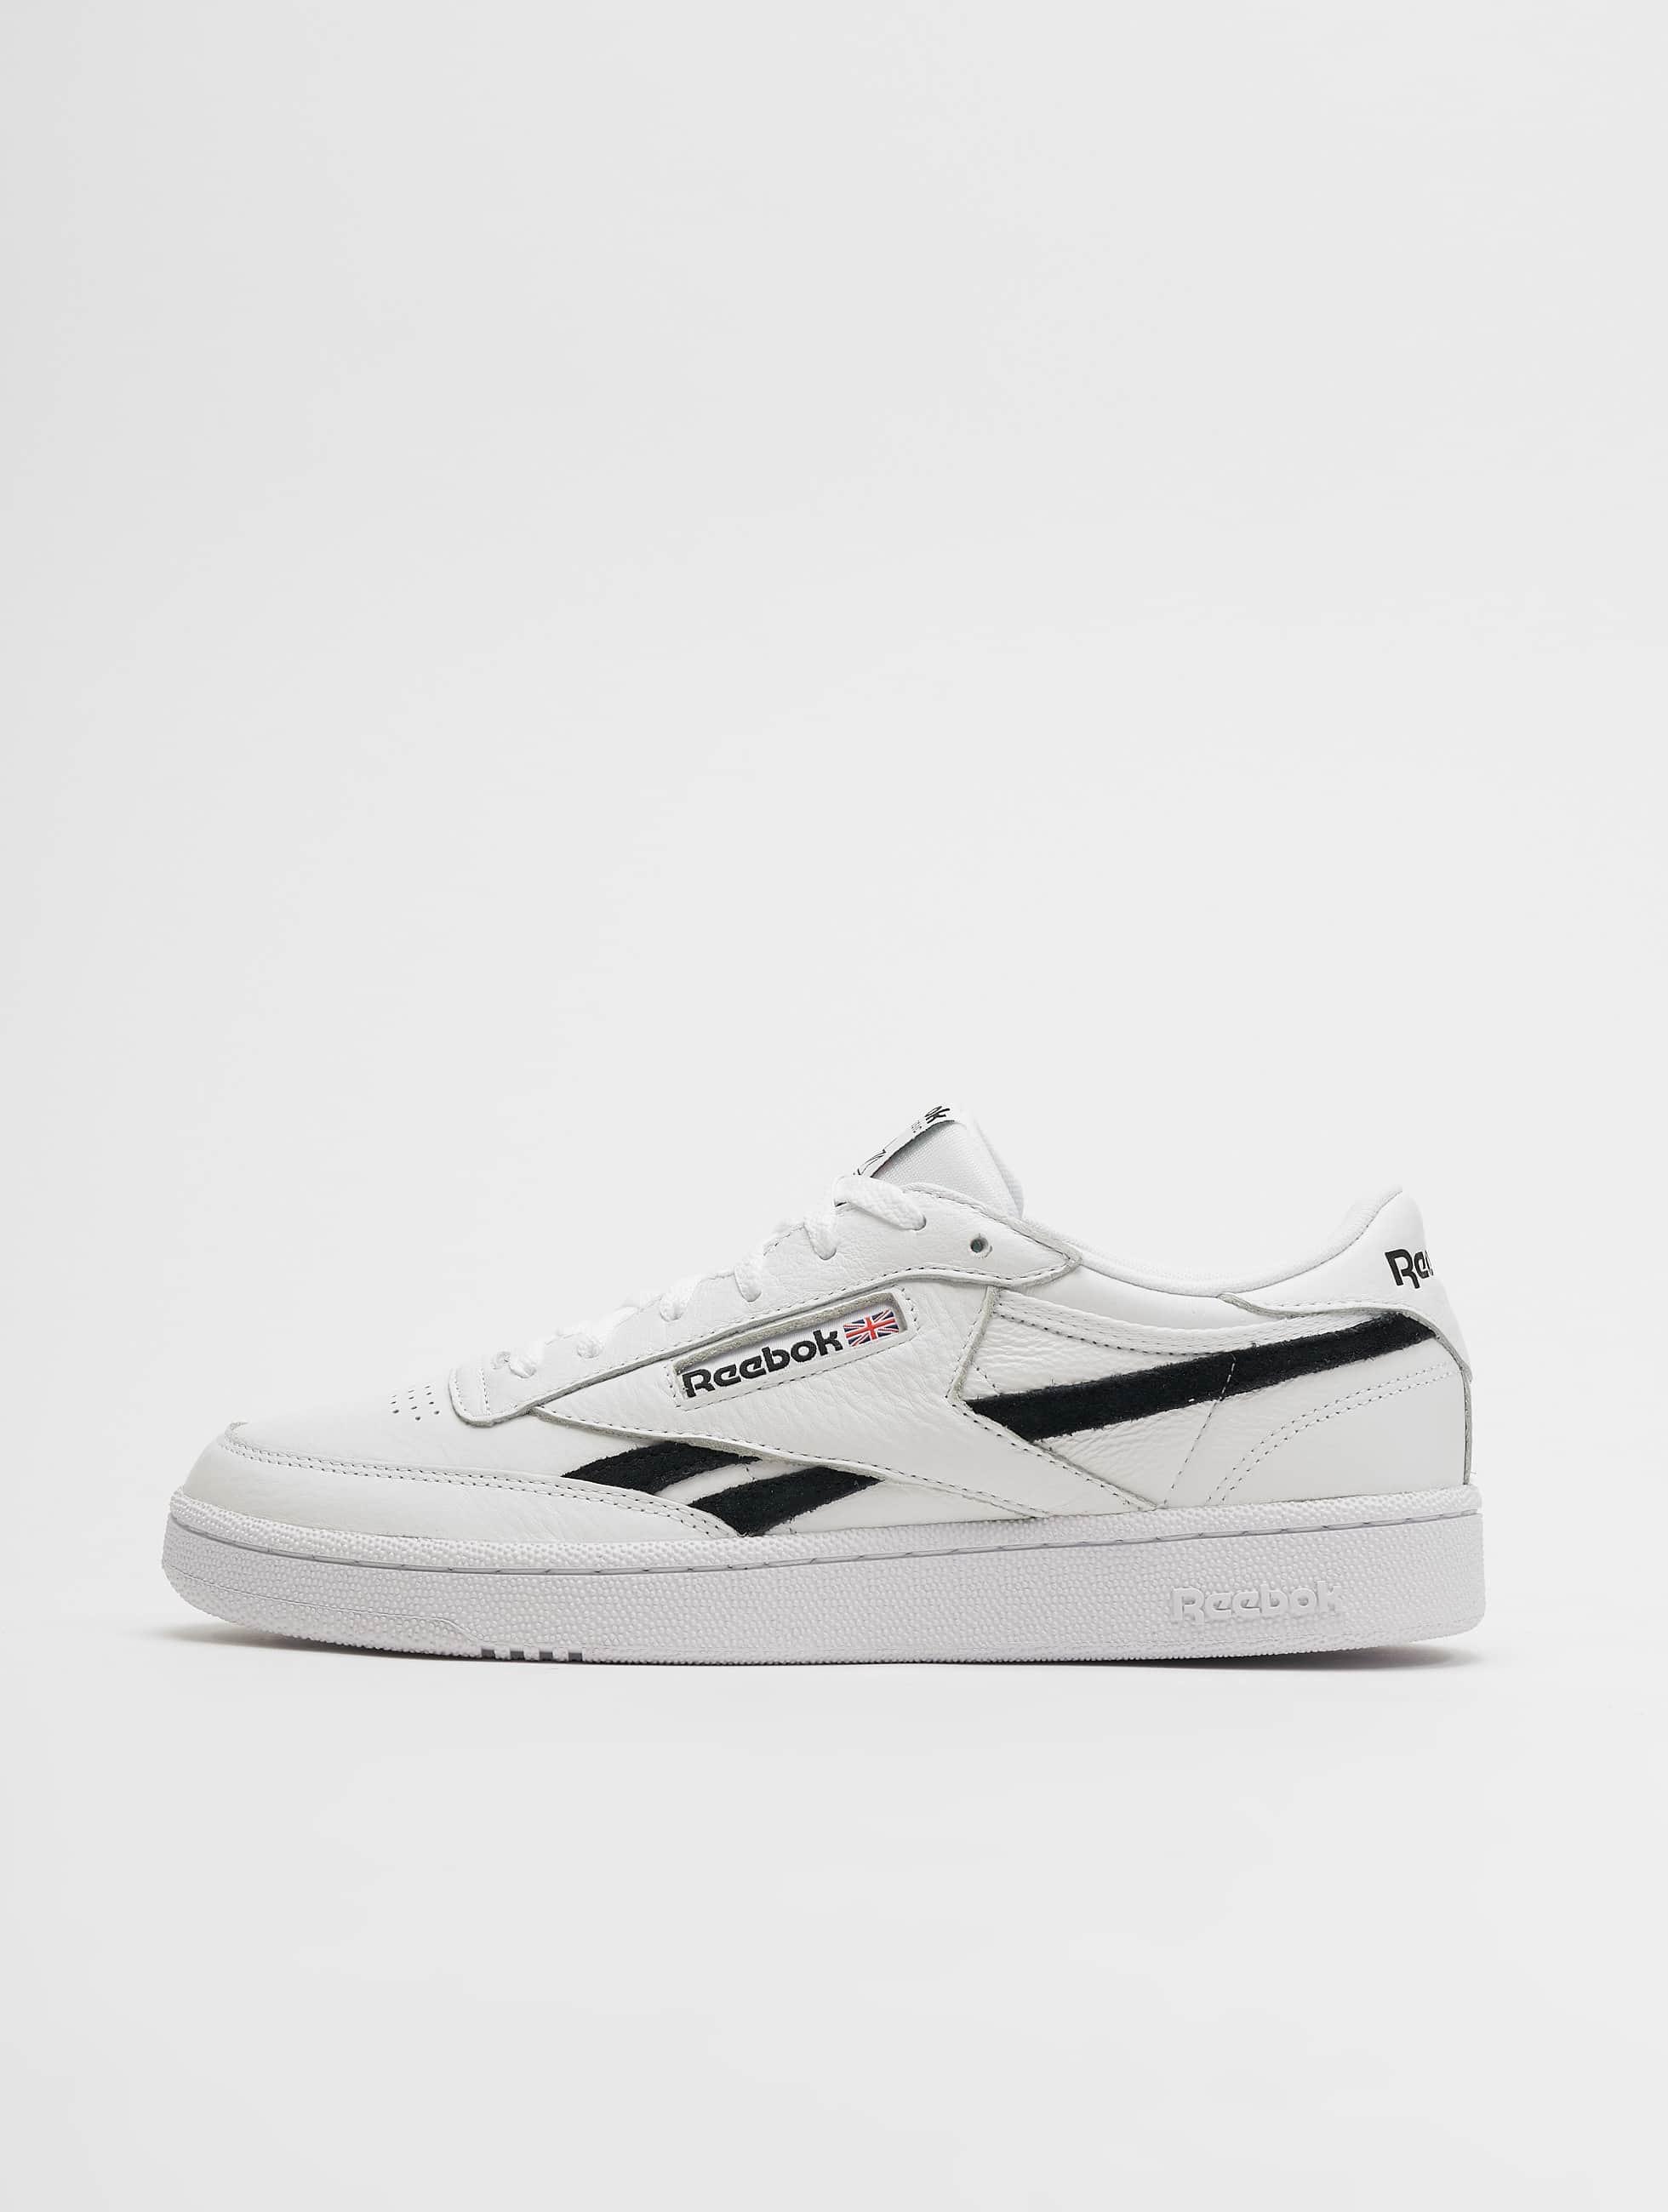 Reebok Classic Leather Mu Sneakers BlackWhiteShadowPurple